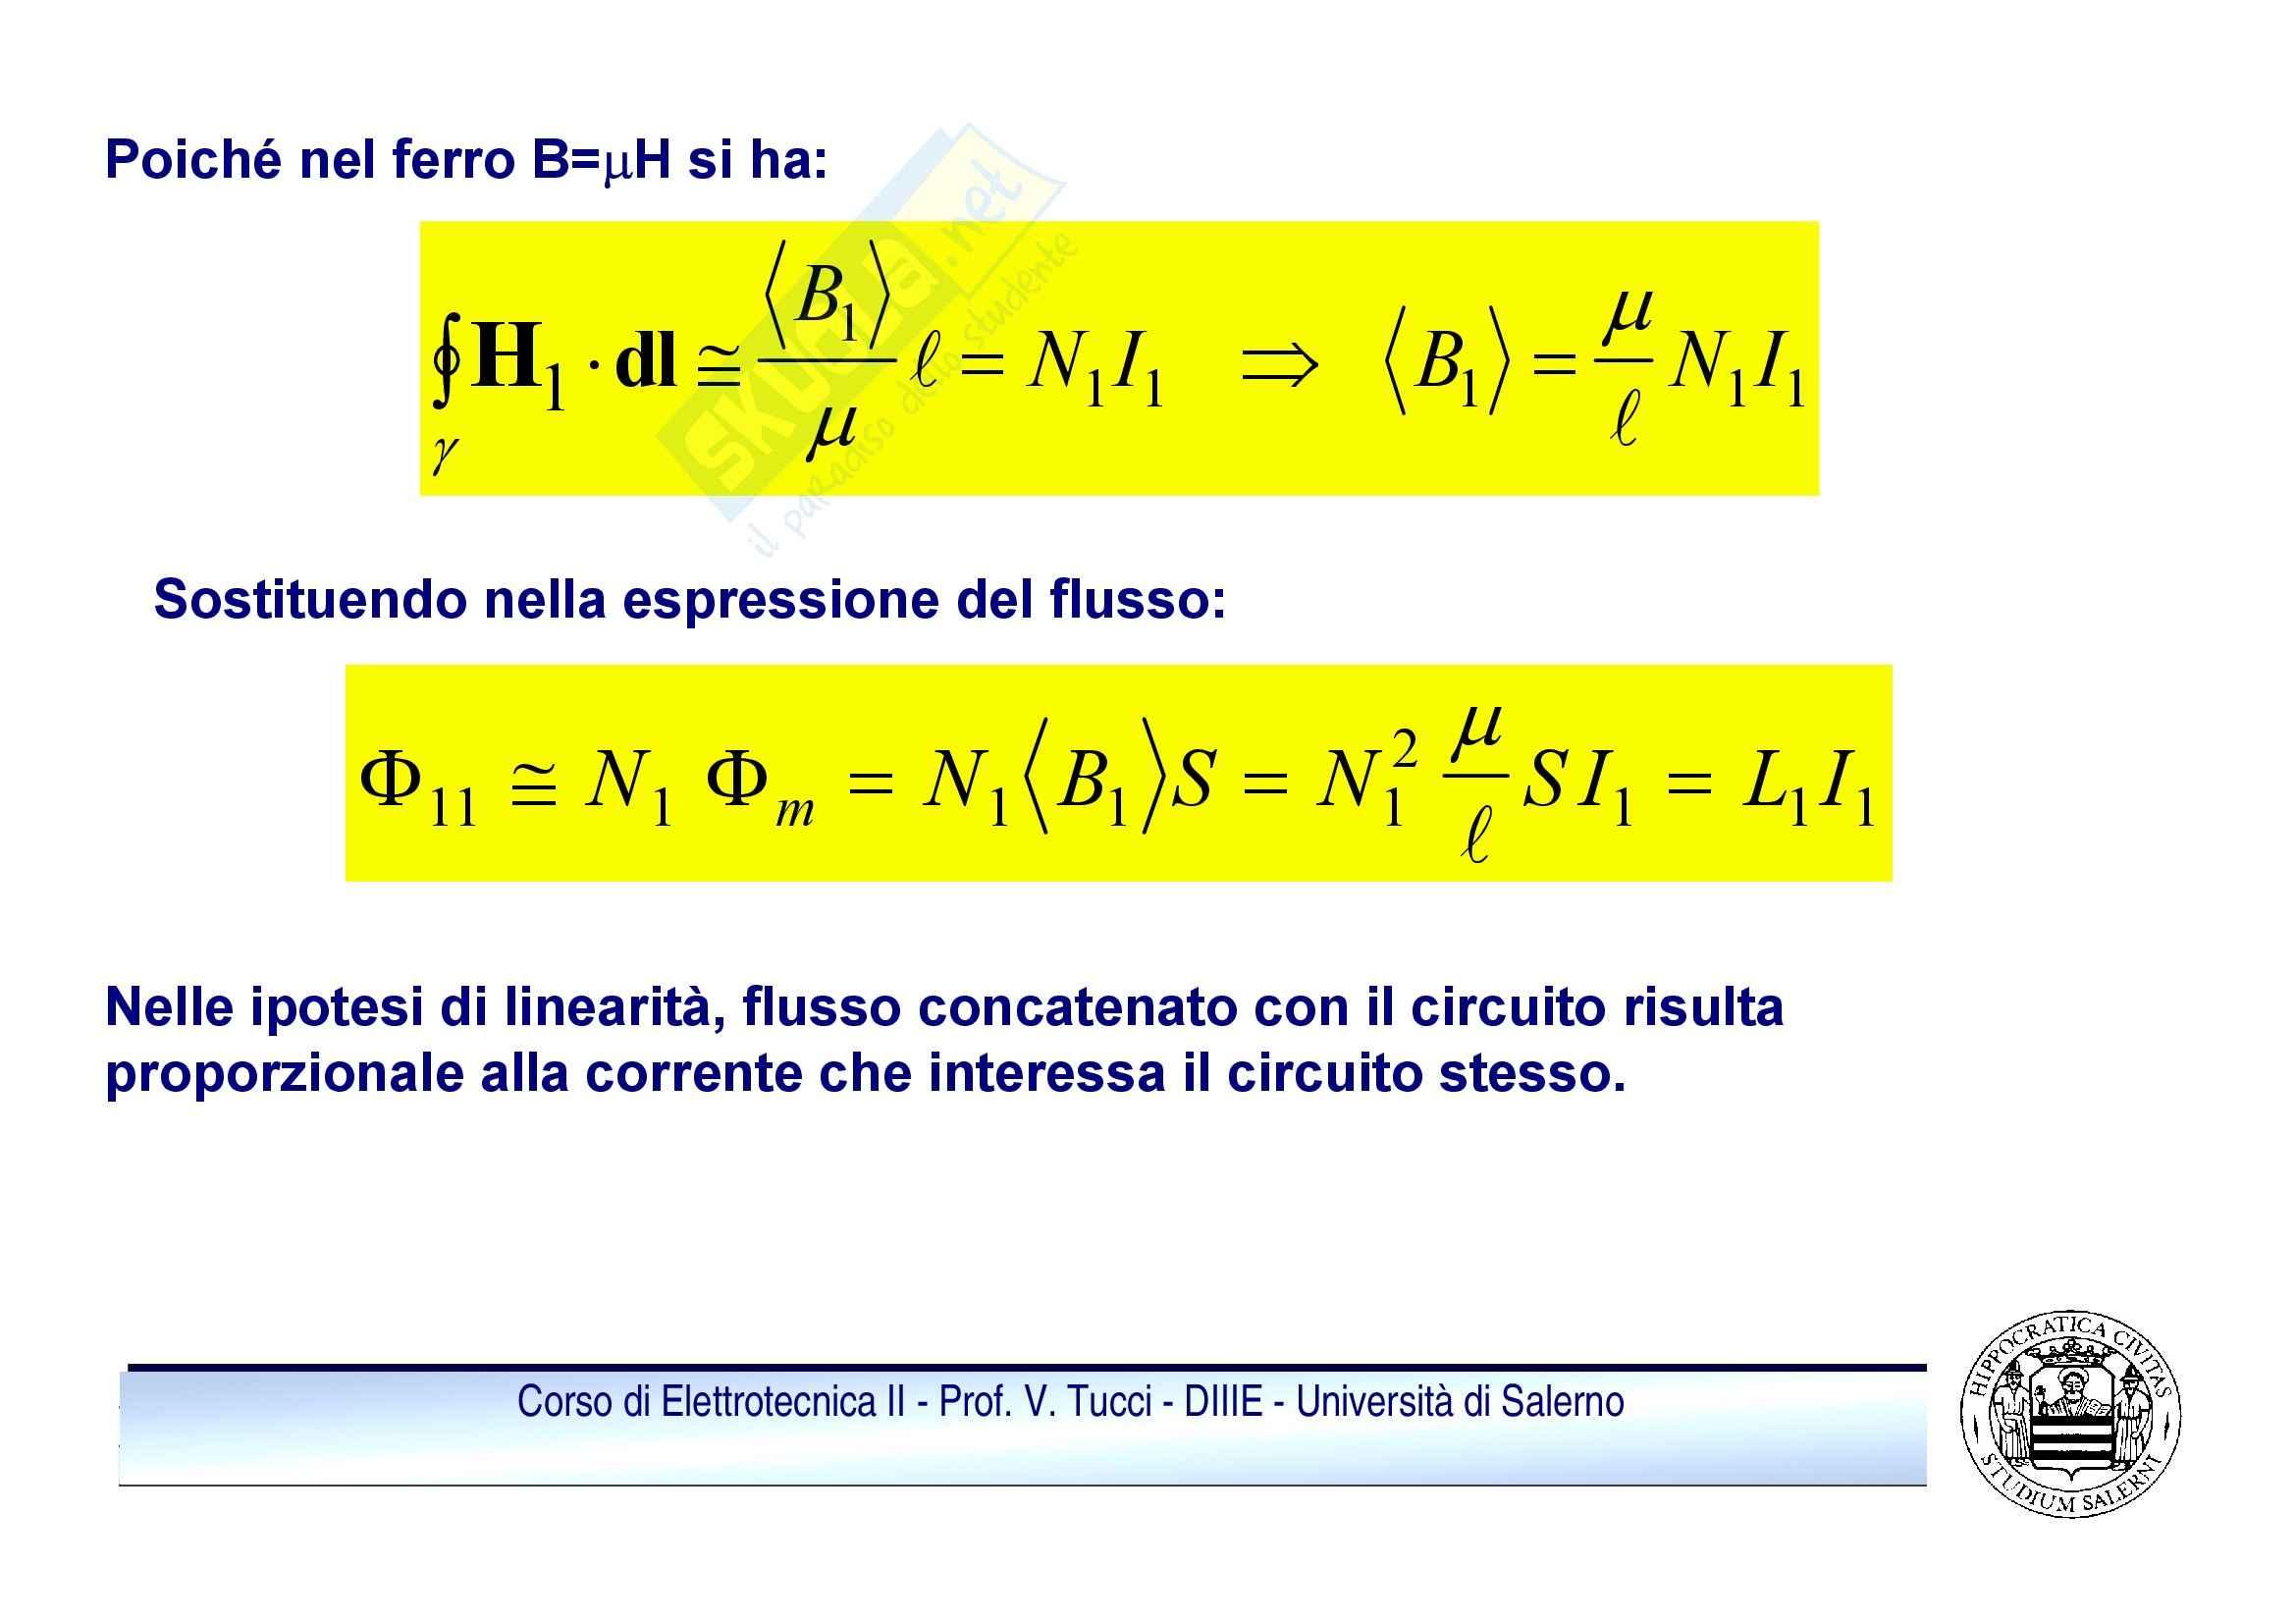 Doppi bipoli - regime sinusoidale Pag. 21